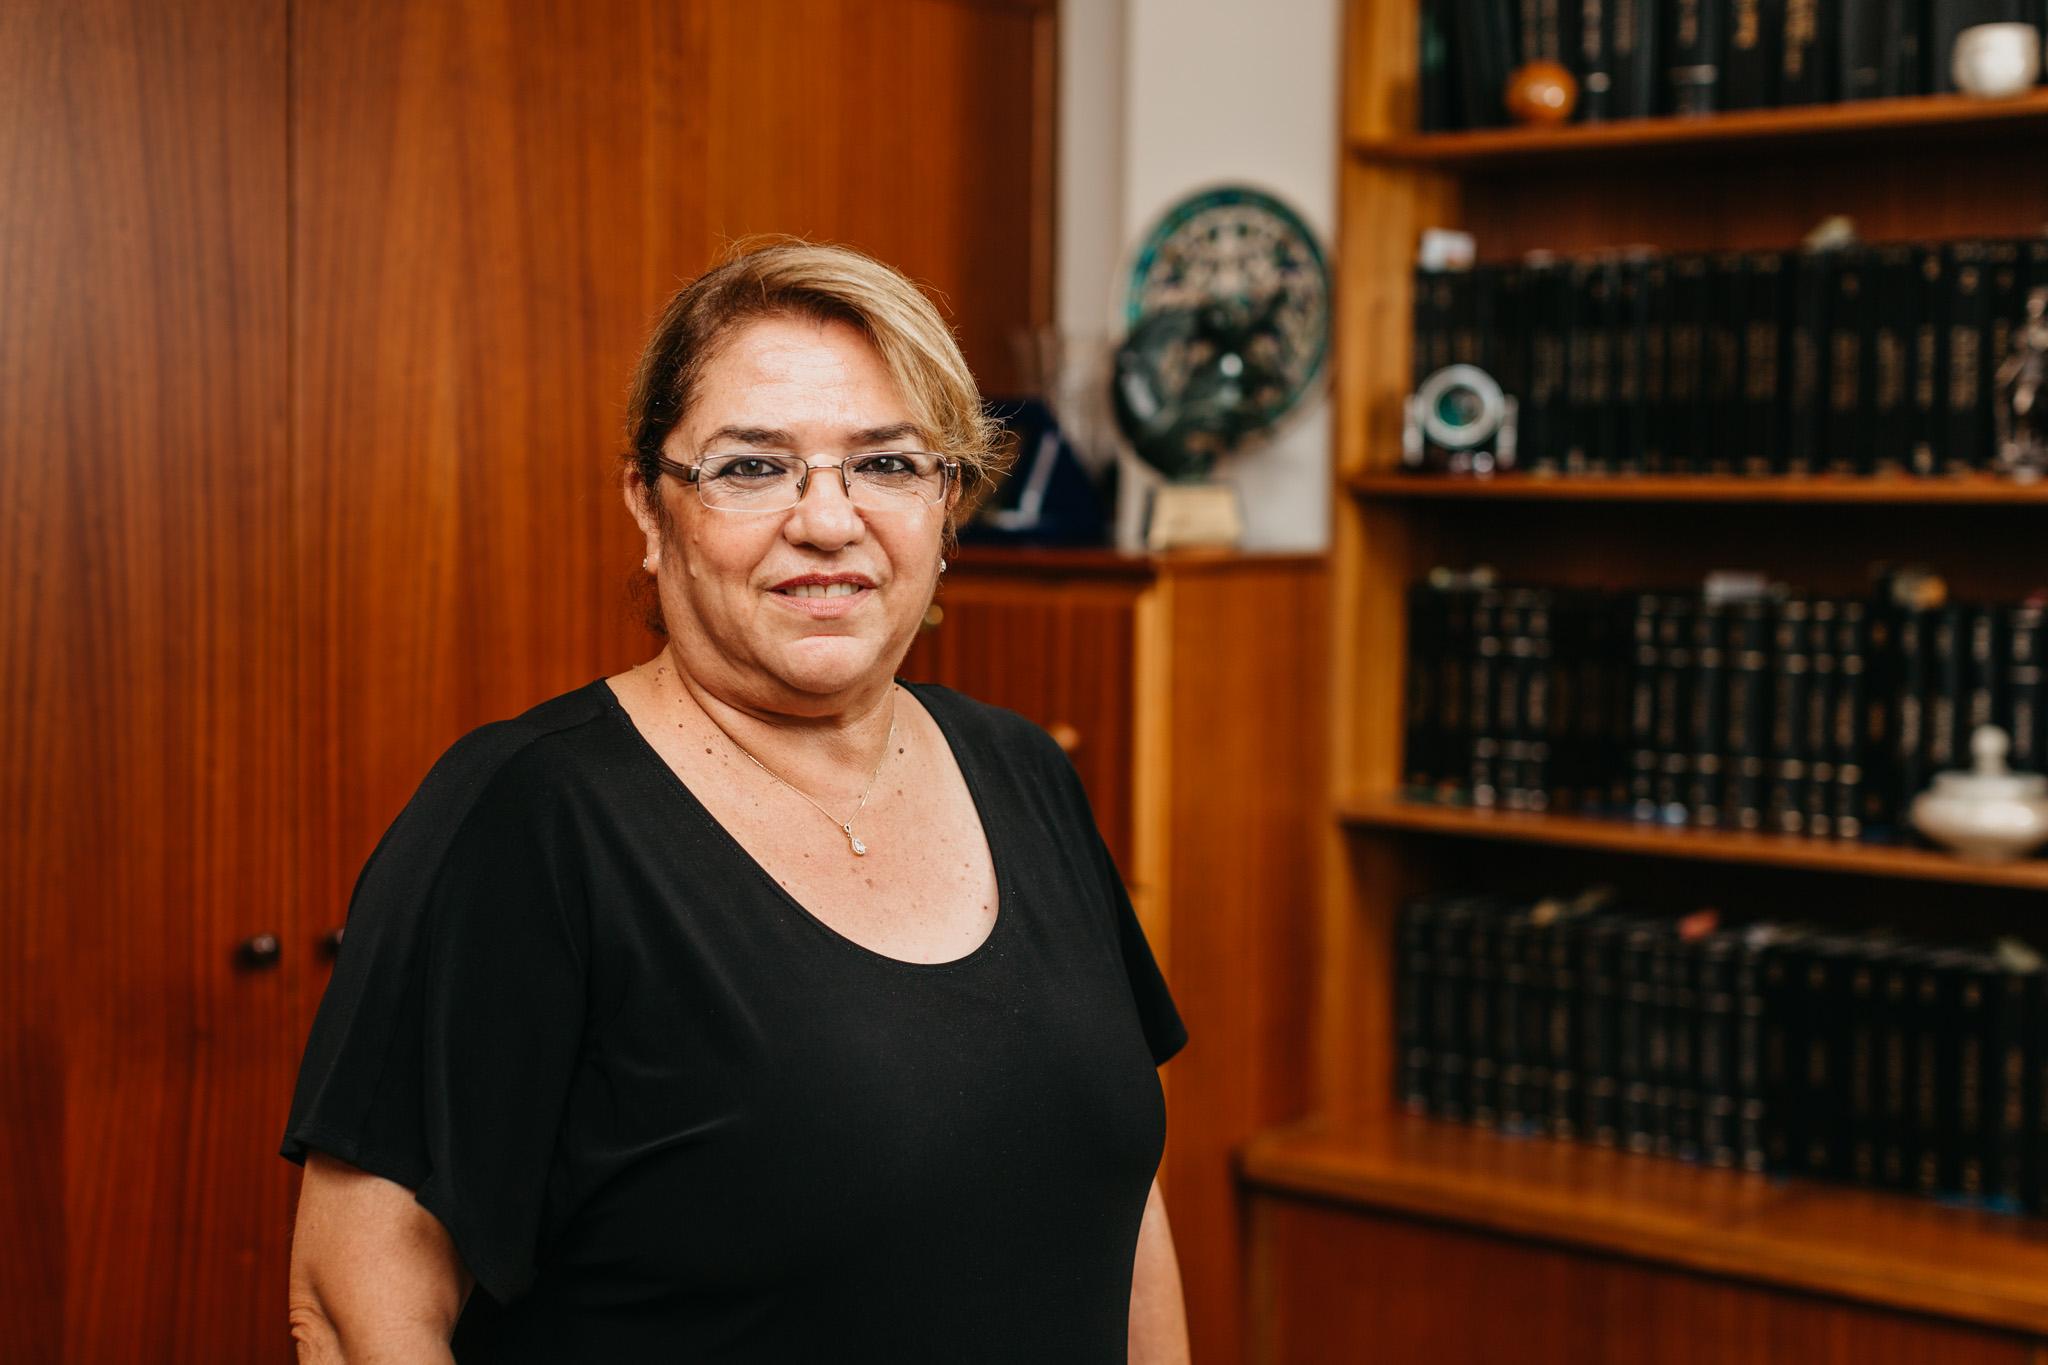 Havva Şanlıtürk is a senior secretary at Erginel Law. She has been working at Erginel Law since 1978. Havva is an expert at inheritance procedure